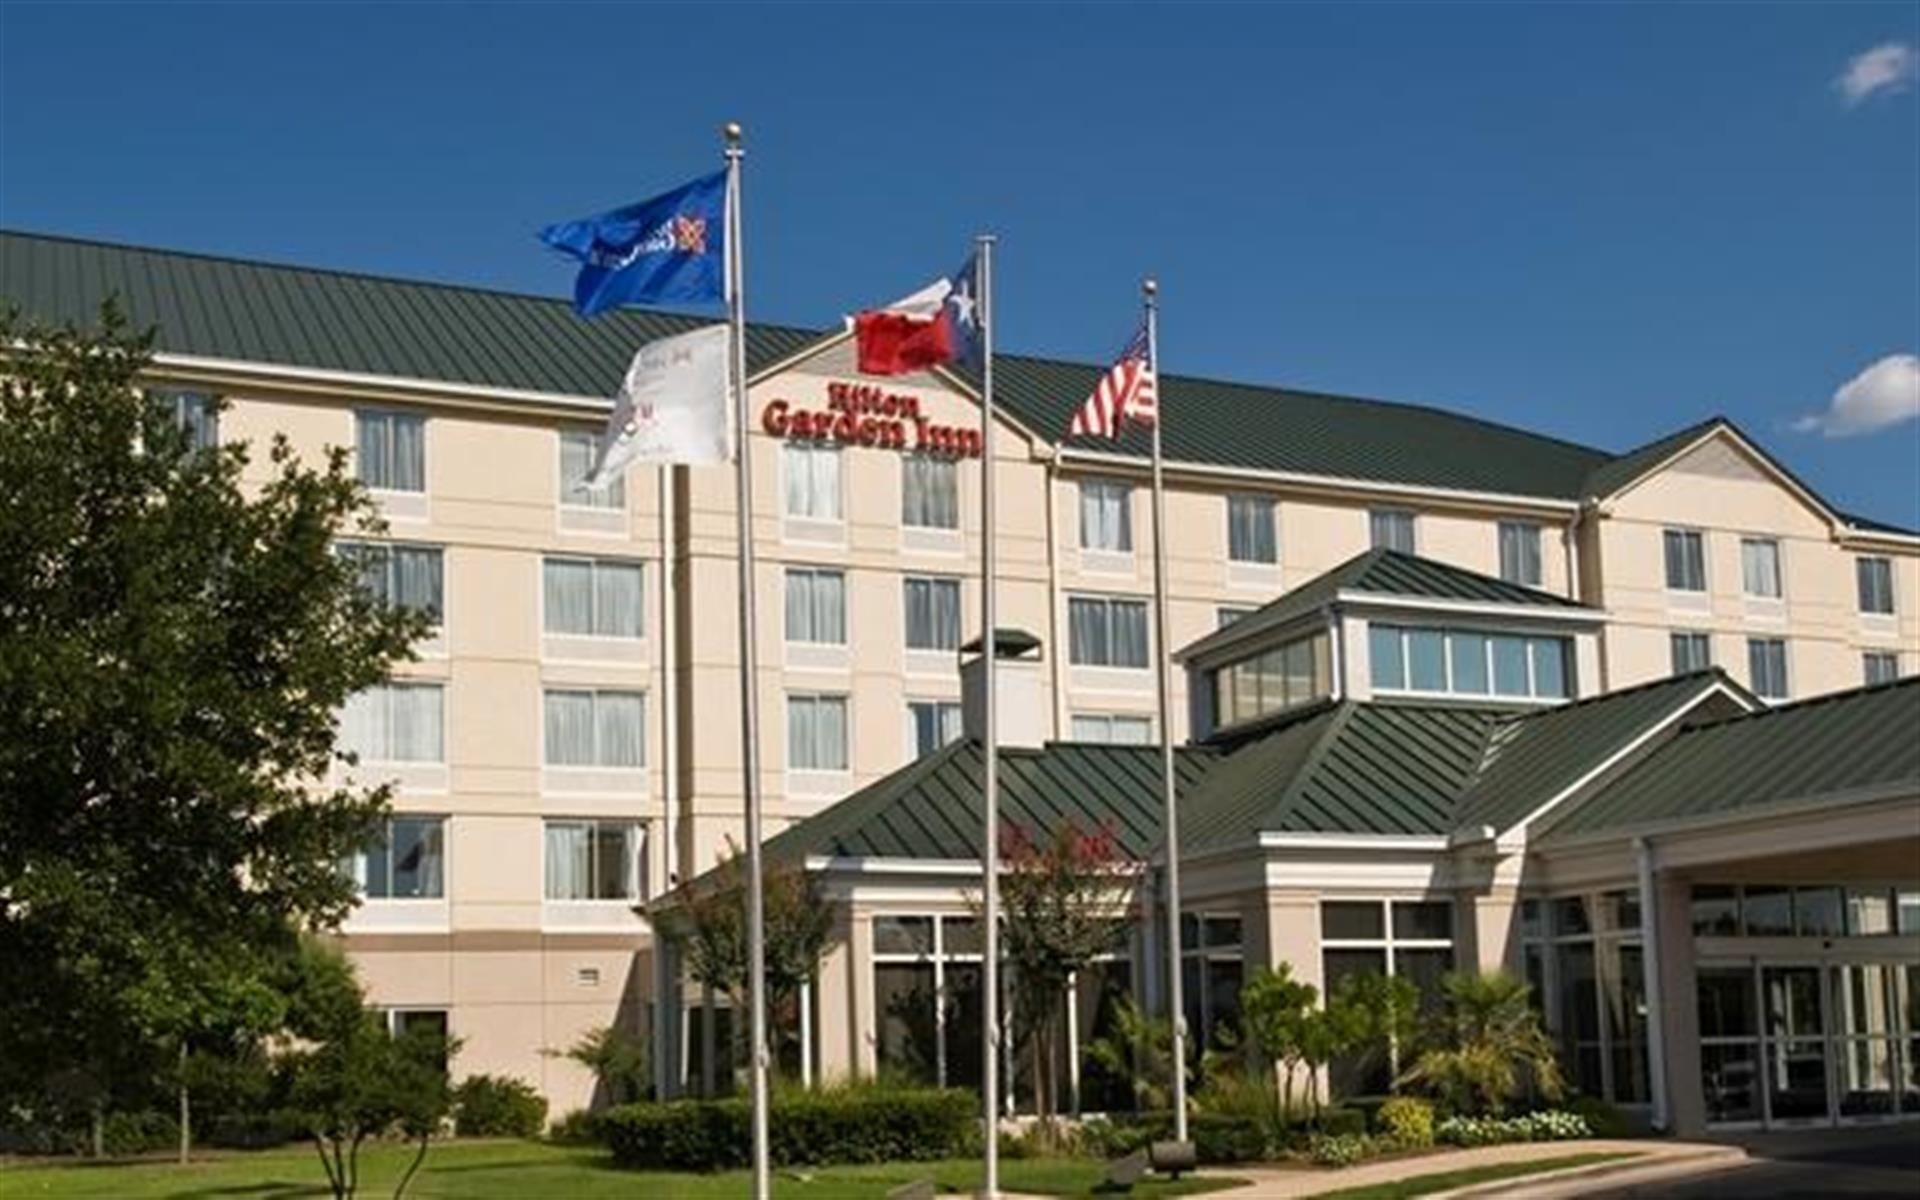 Hilton Garden Inn Austin NW/Arboretum - Suite 104